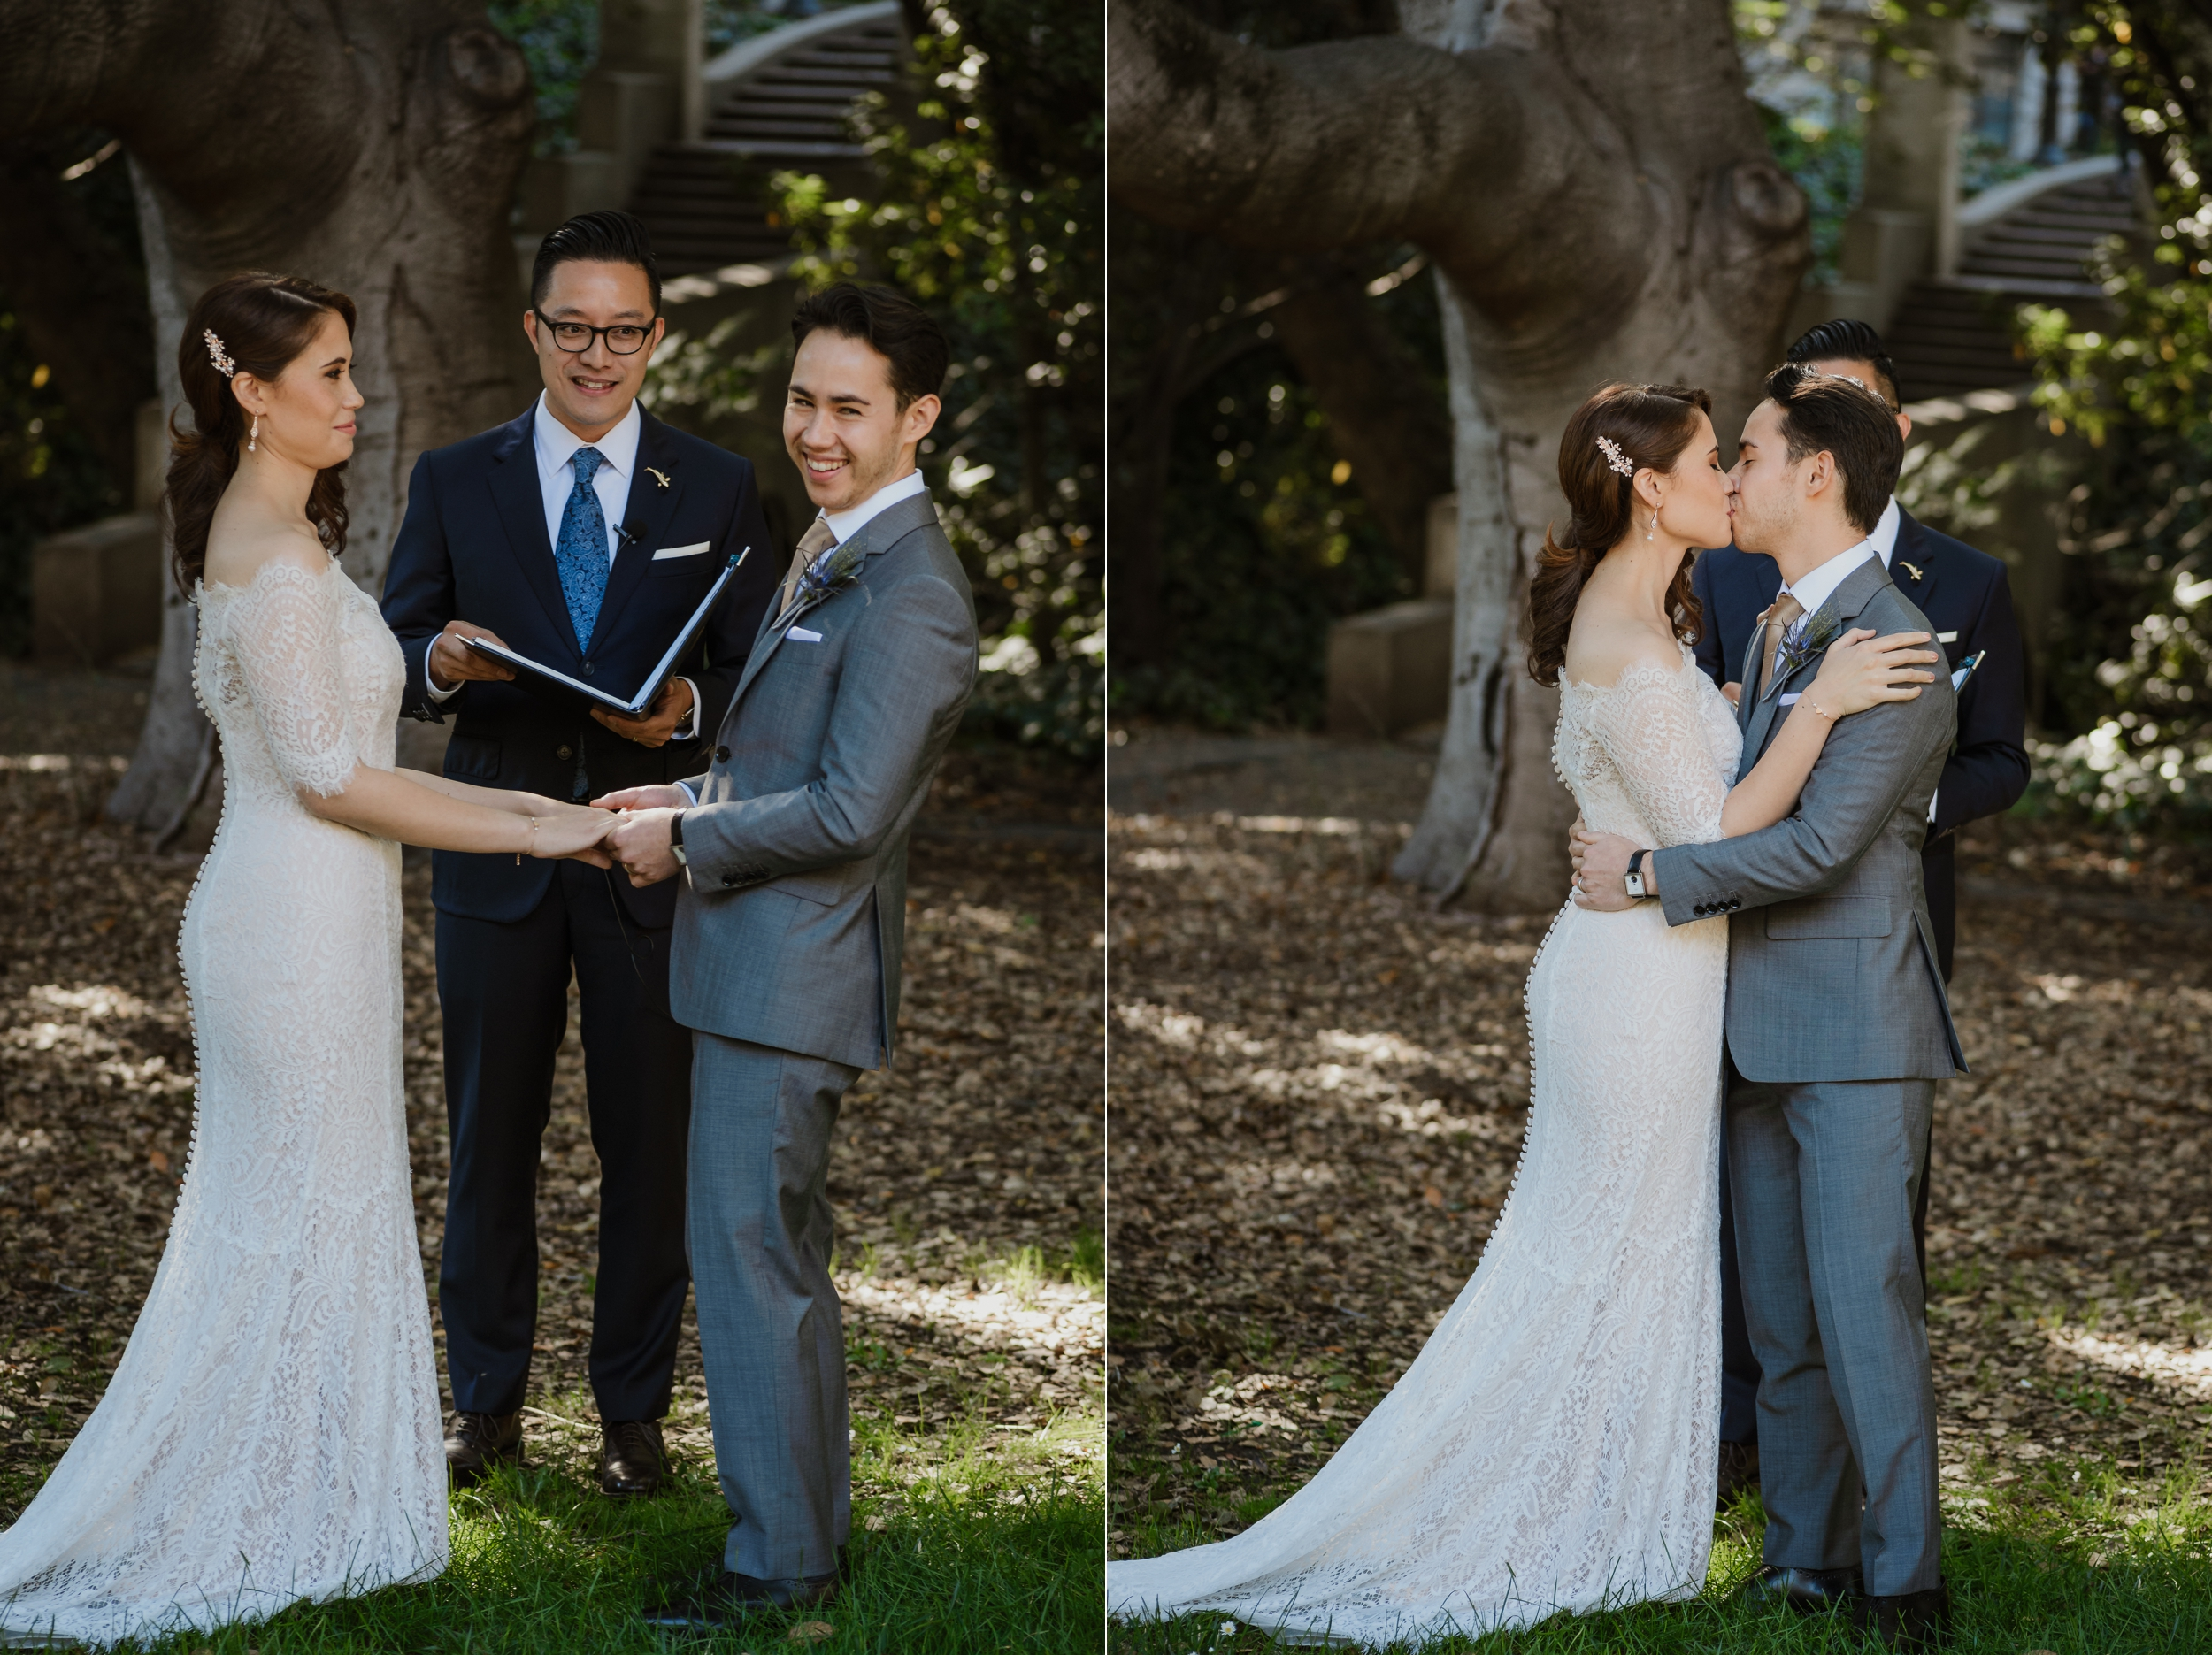 35-berkeley-uc-faculty-club-wedding-kb-vivianchen-257_WEB.jpg